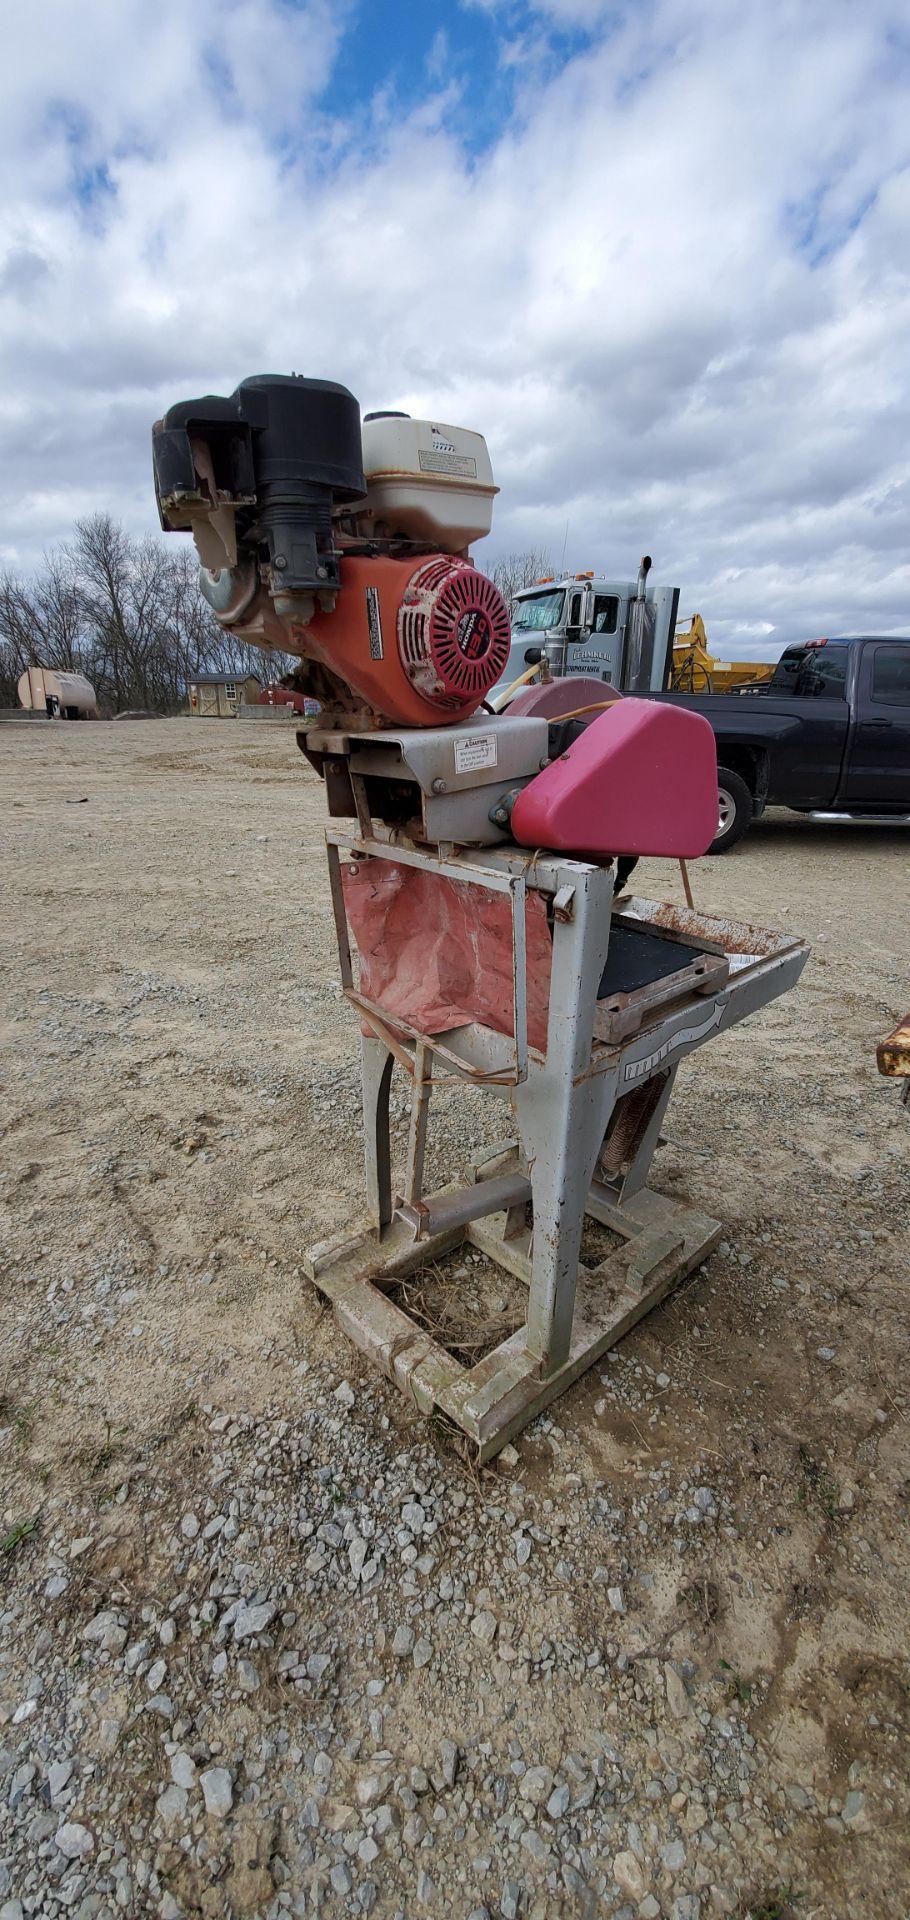 Stone Model MS2 20 in Masonry Block Saw, 13 HP Honda Gas Engine - Image 2 of 8